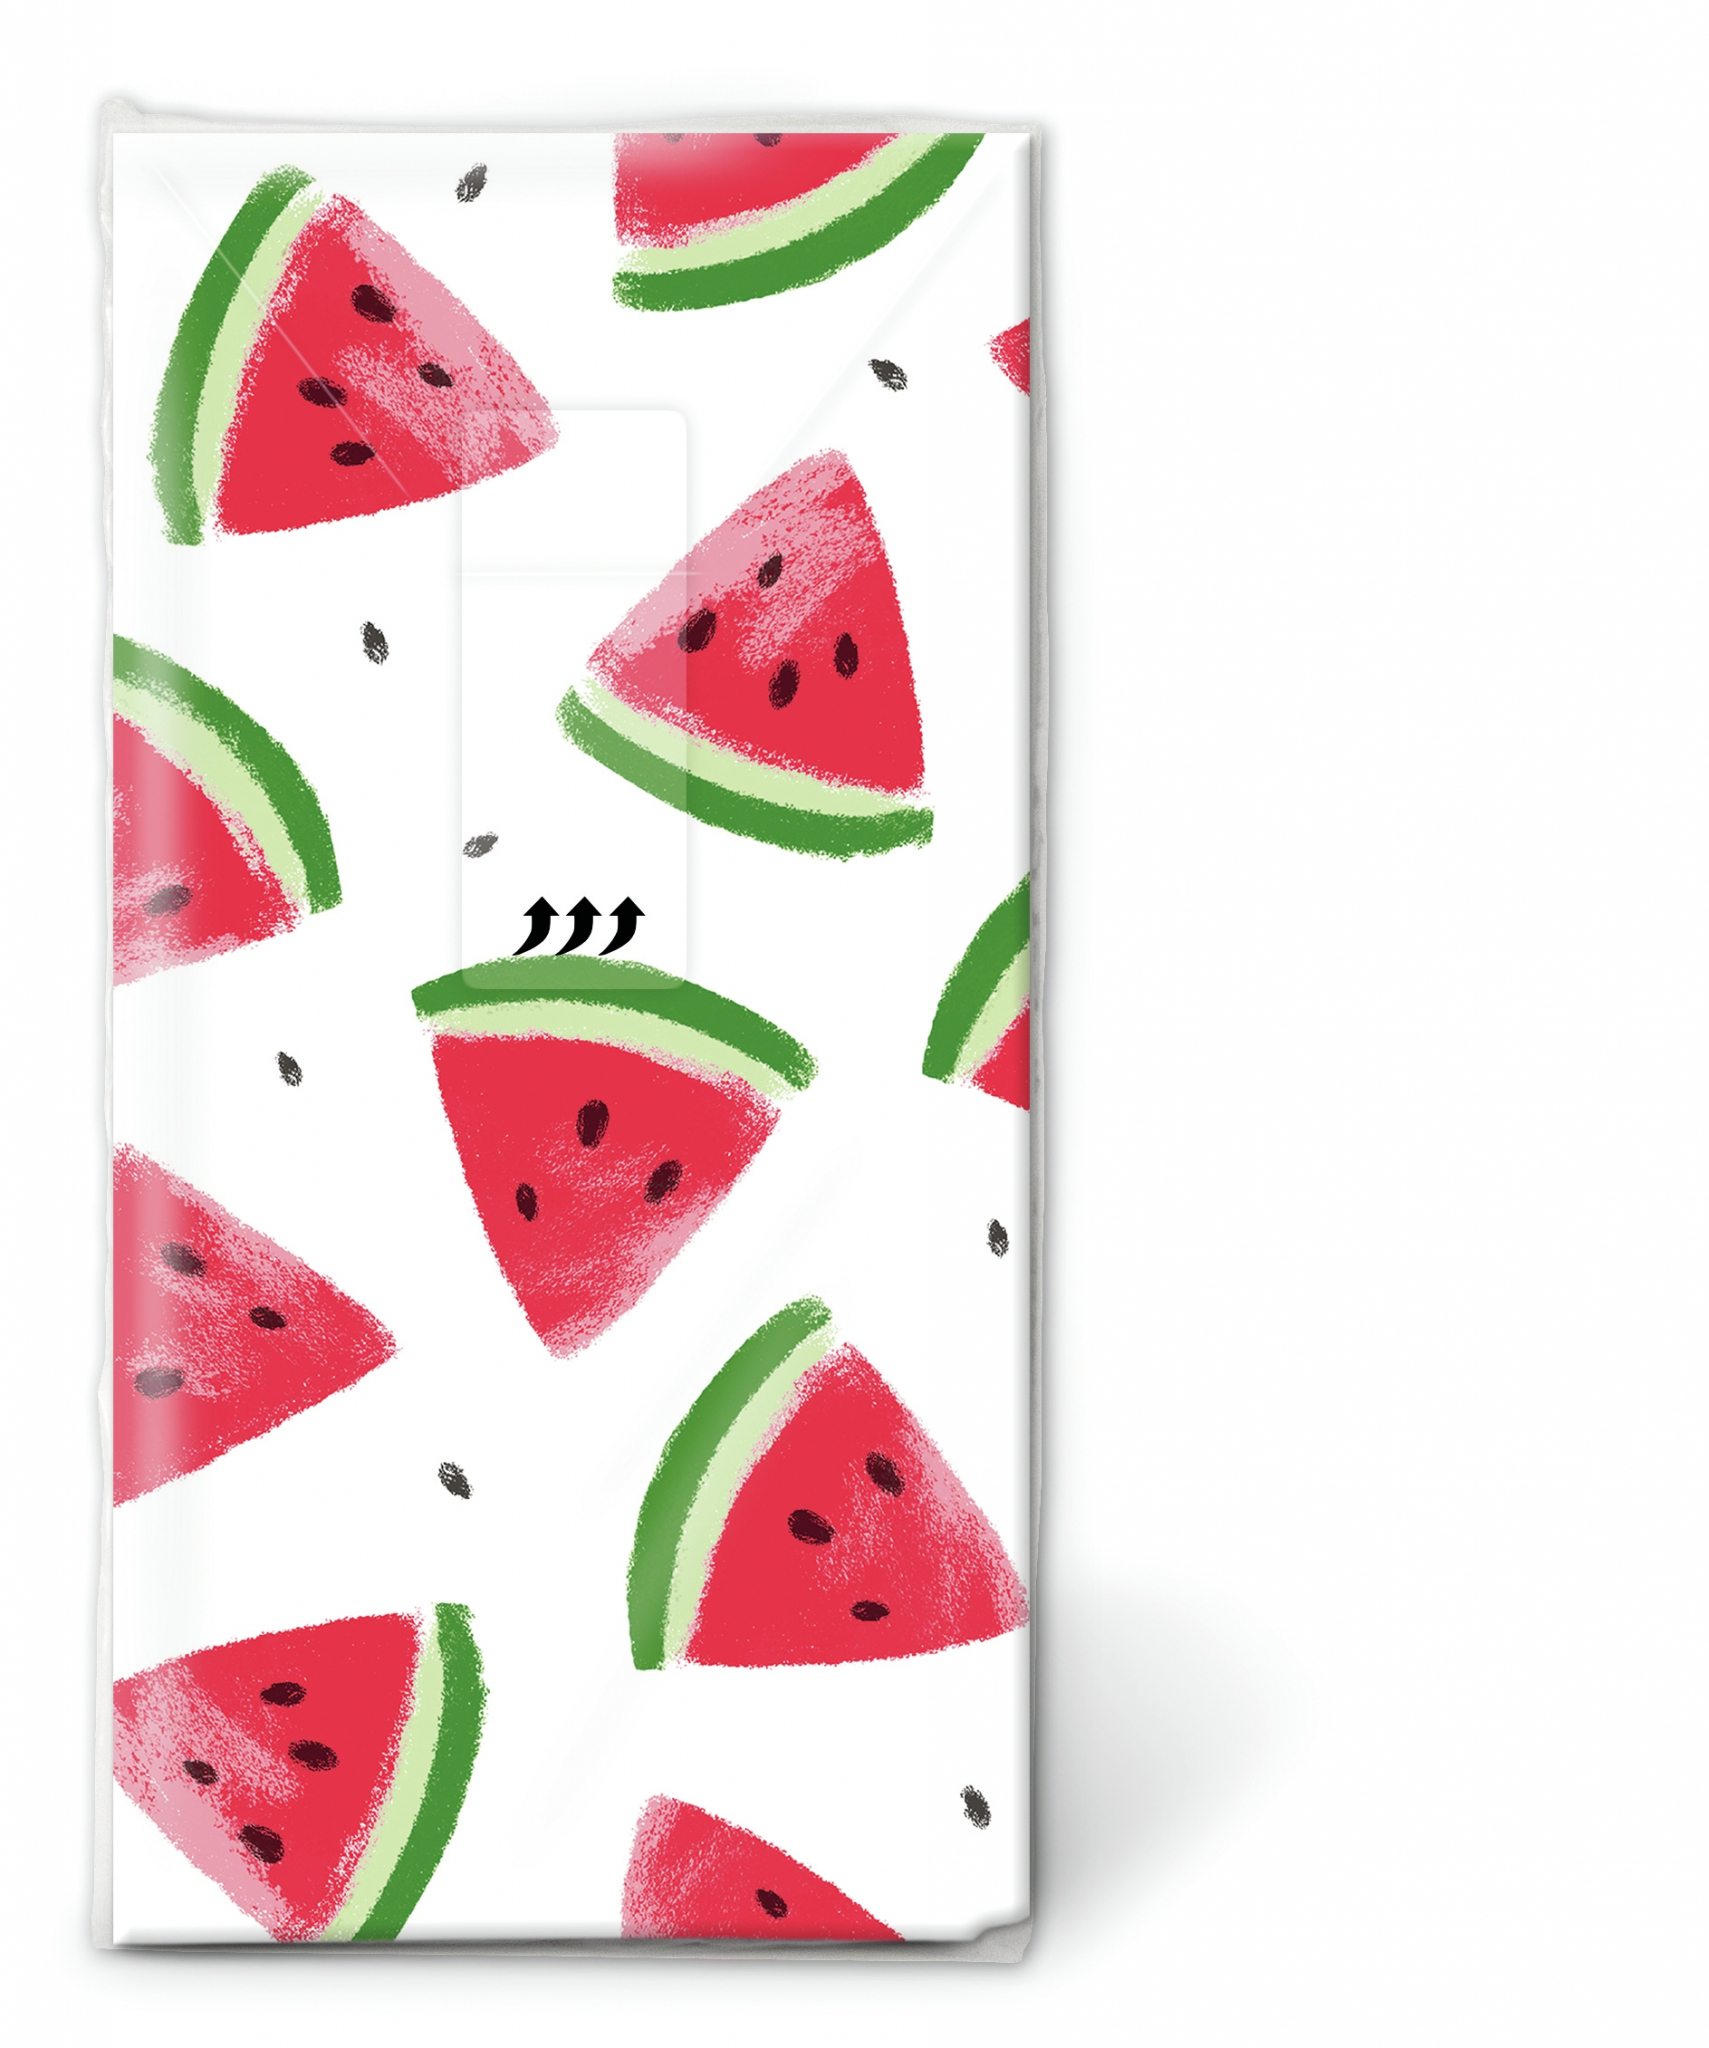 Handkerchiefs - Melon pieces